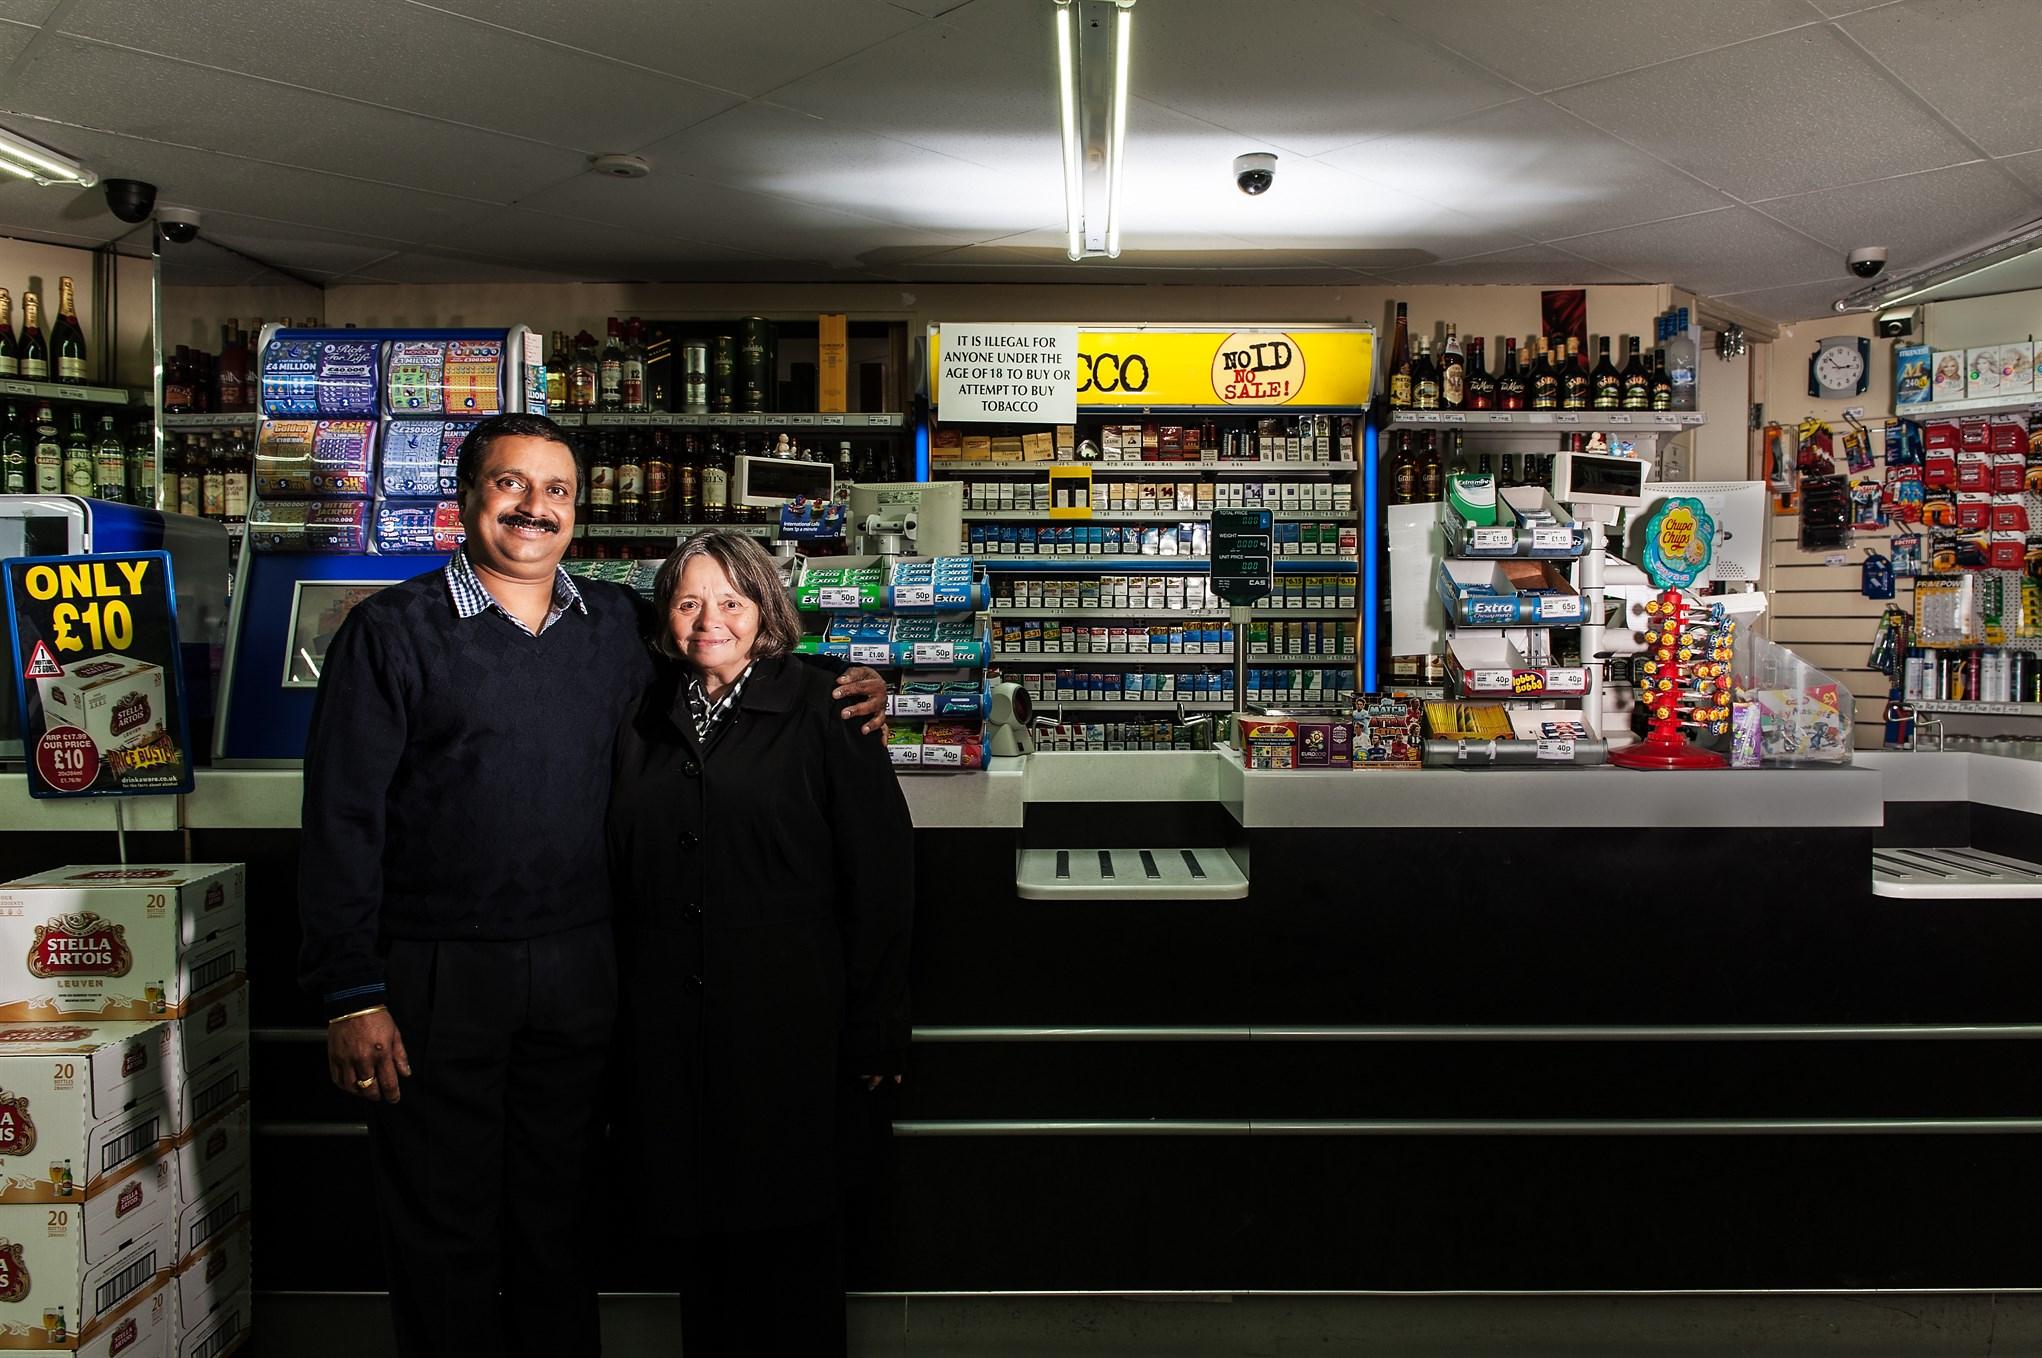 Bhavesh Patel & Barbara Maclean